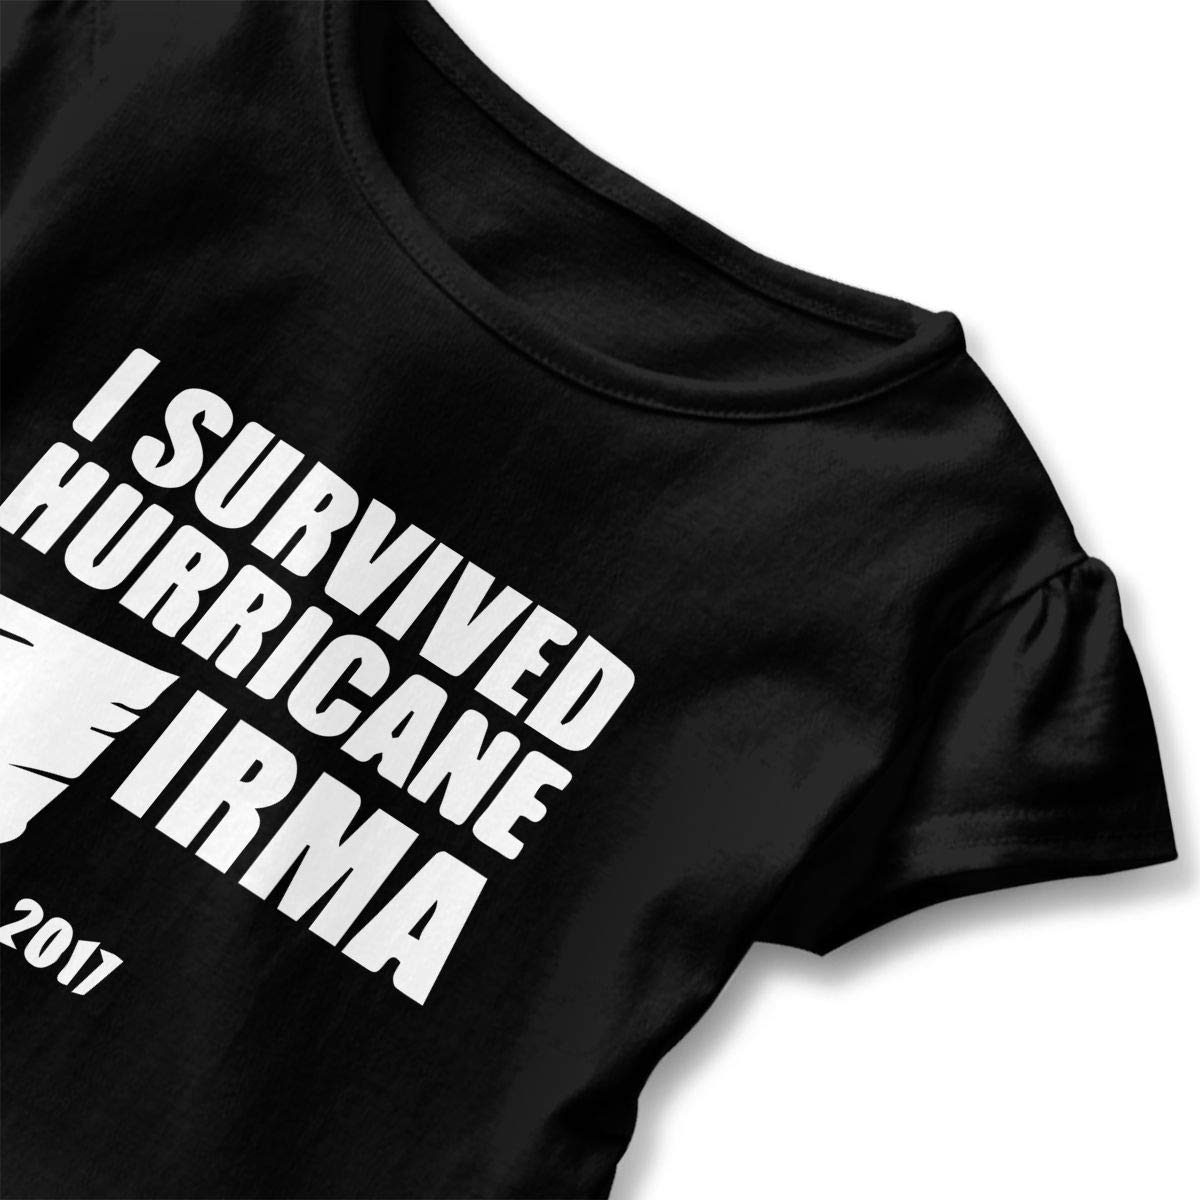 I Survived Hurricane Irma Toddler Girls T Shirt Kids Cotton Short Sleeve Ruffle Tee